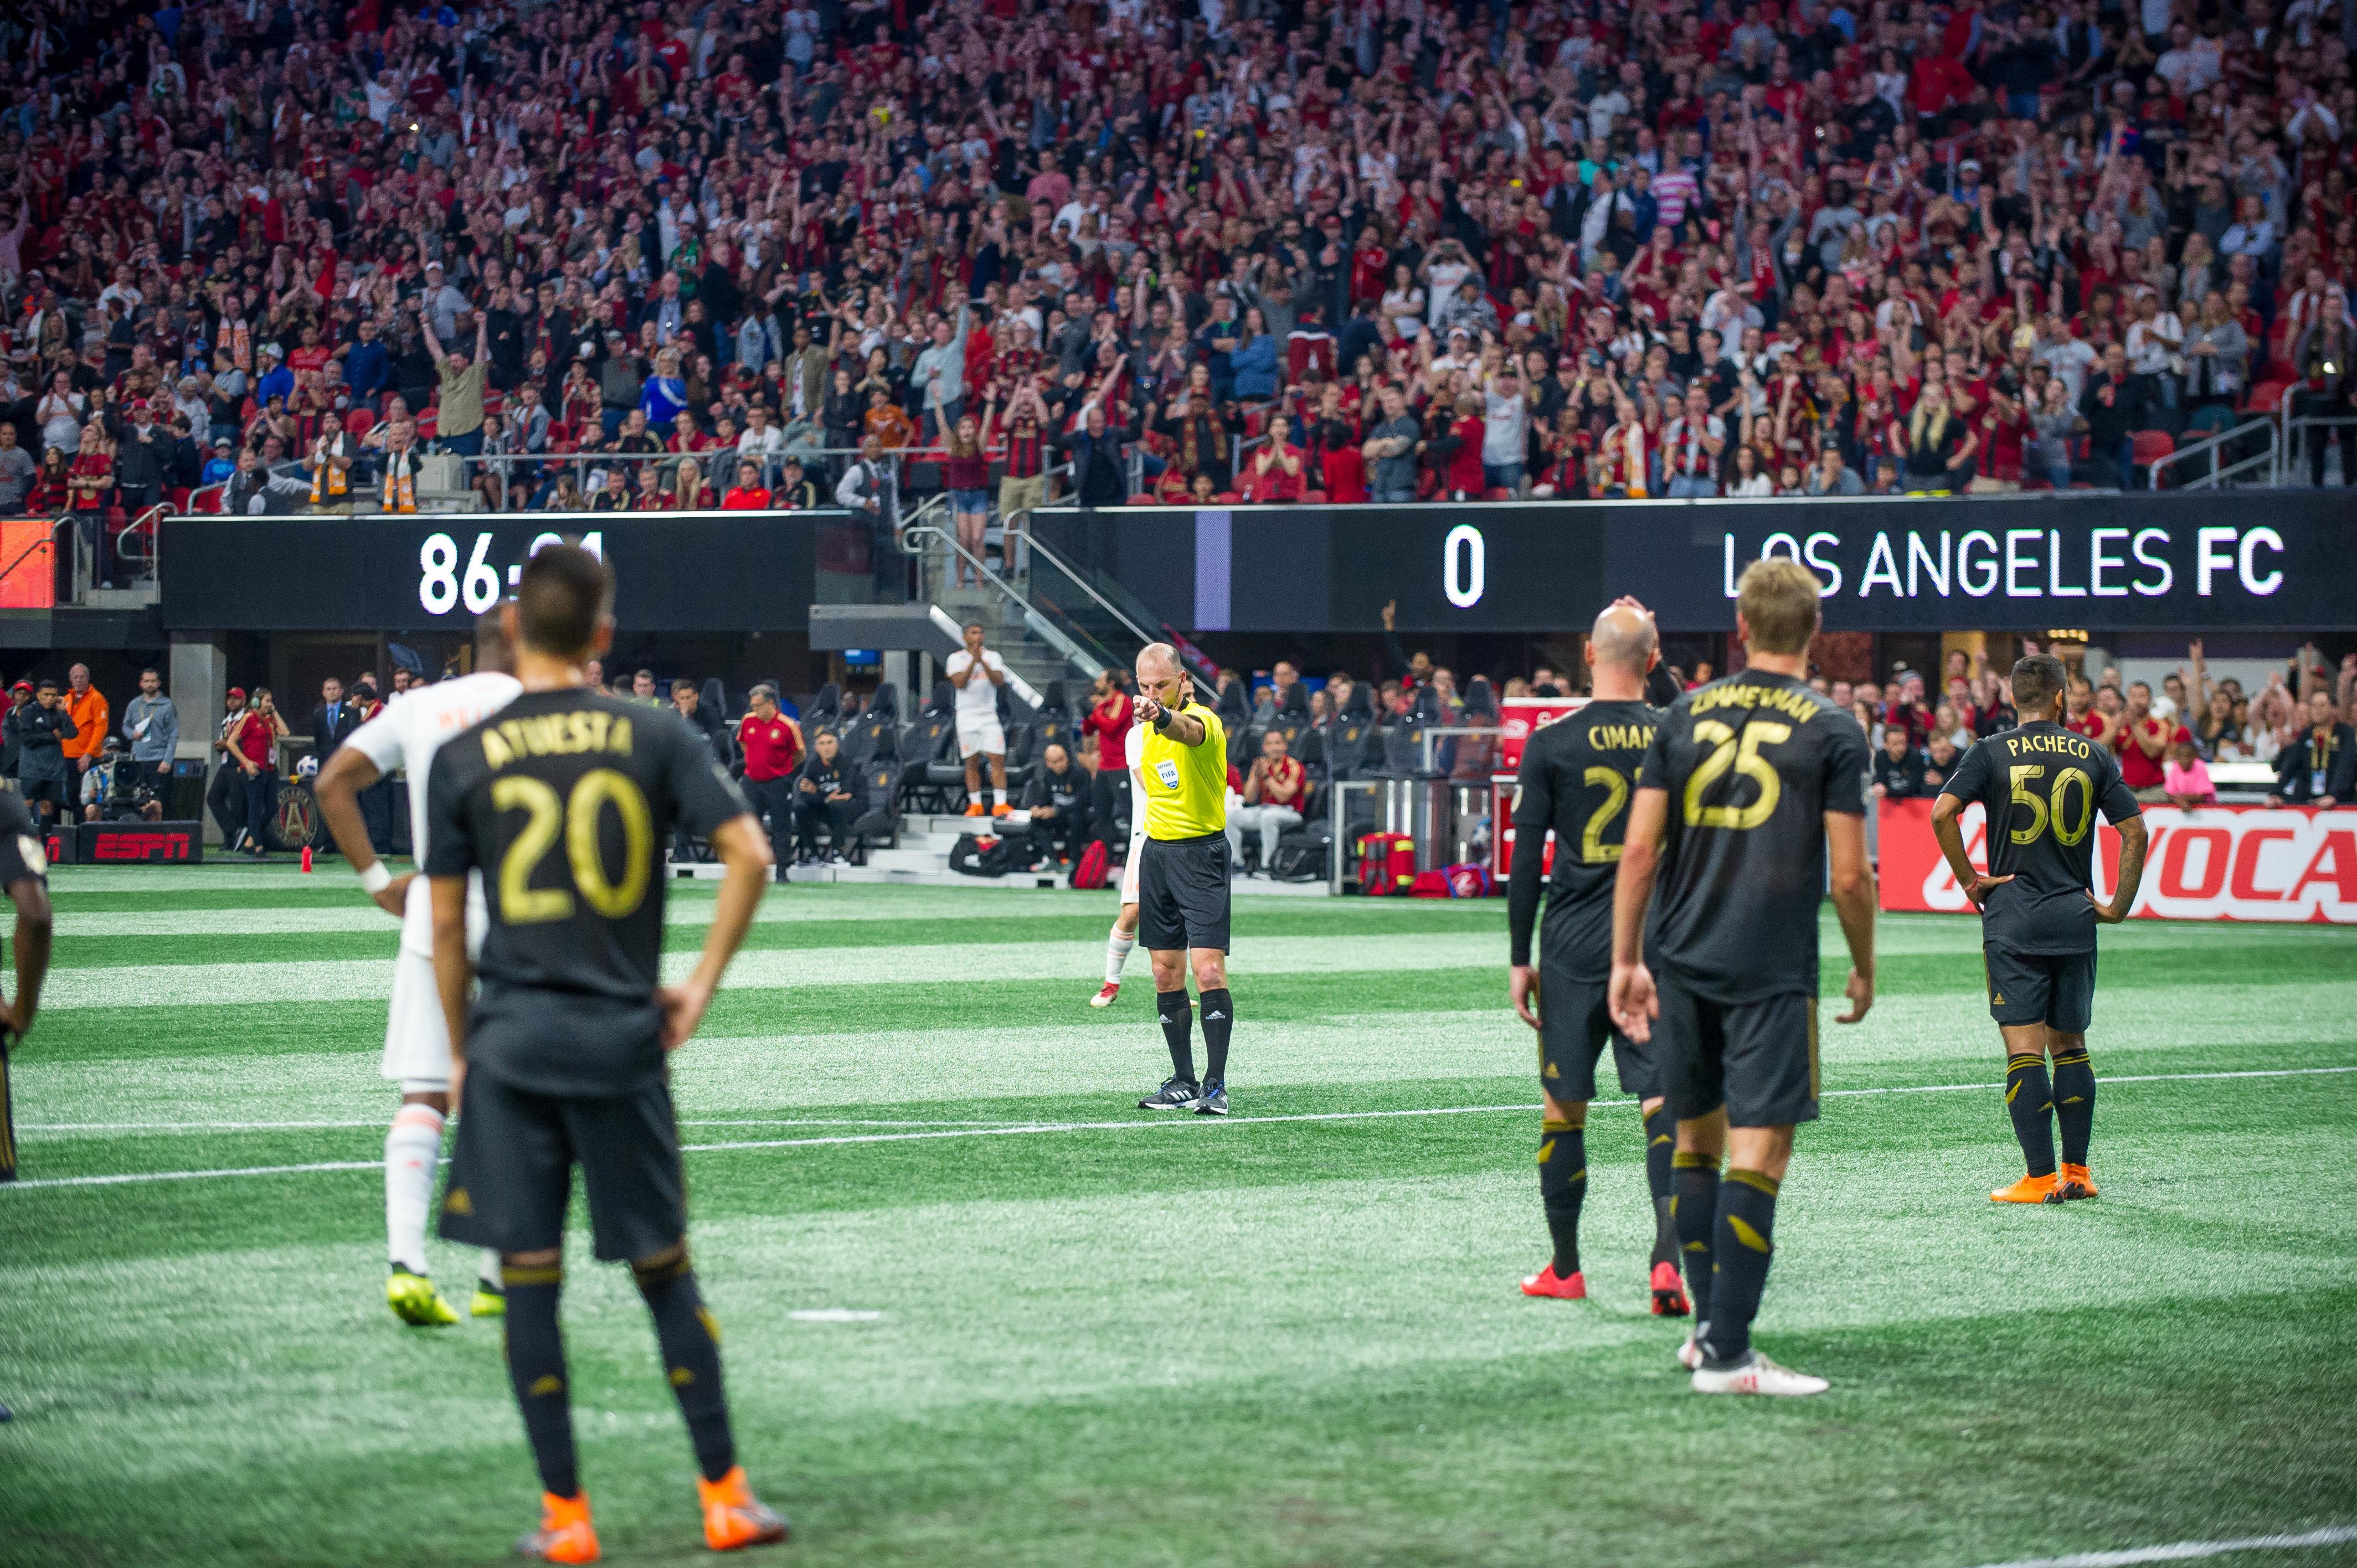 SOCCER: APR 07 MLS - Los Angeles FC at Atlanta United FC